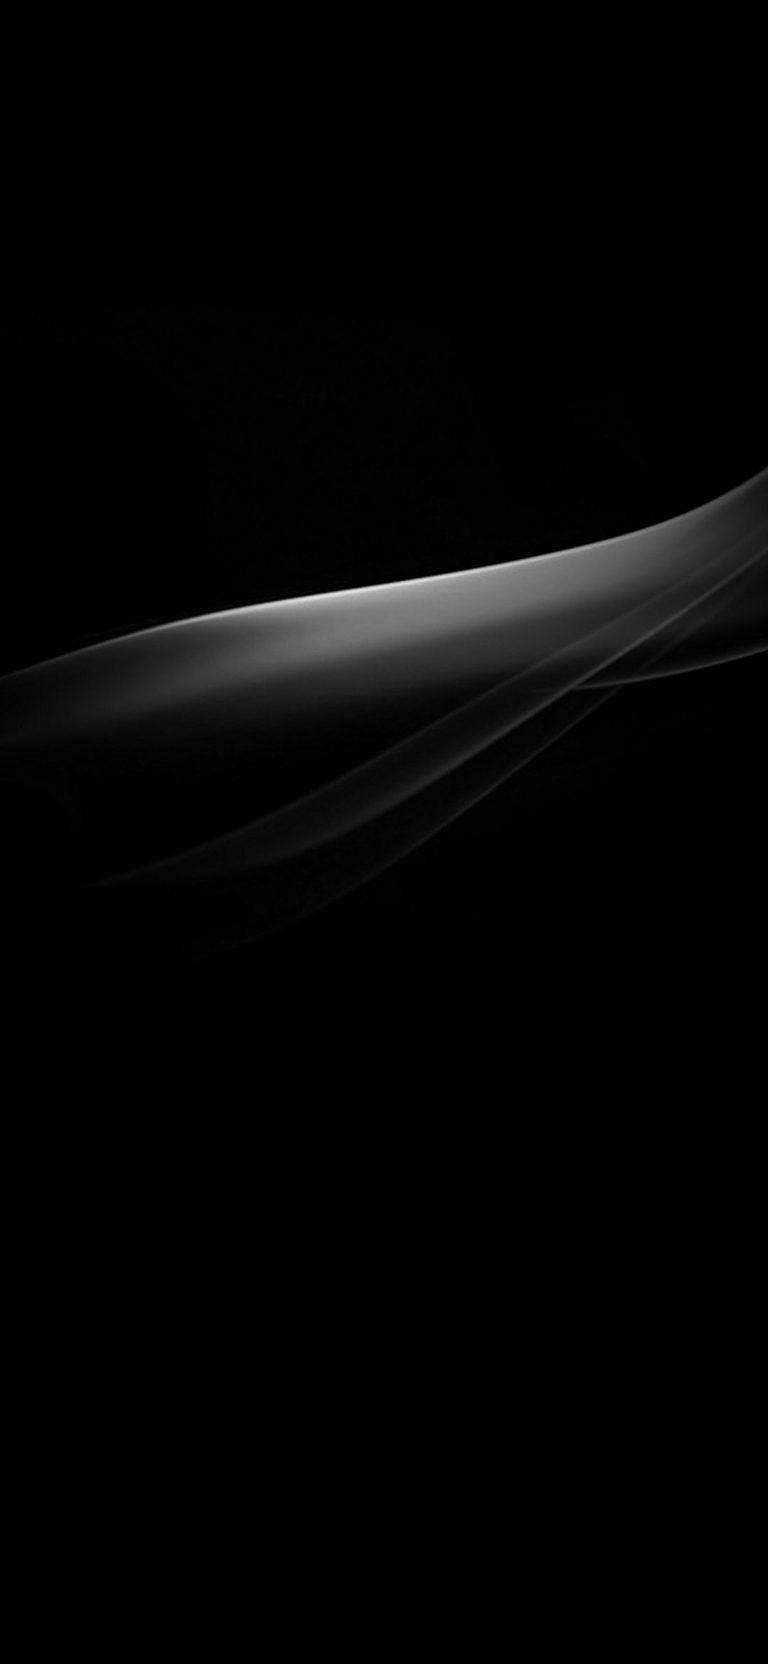 Dark Phone Wallpaper 031 1080x2340 768x1664